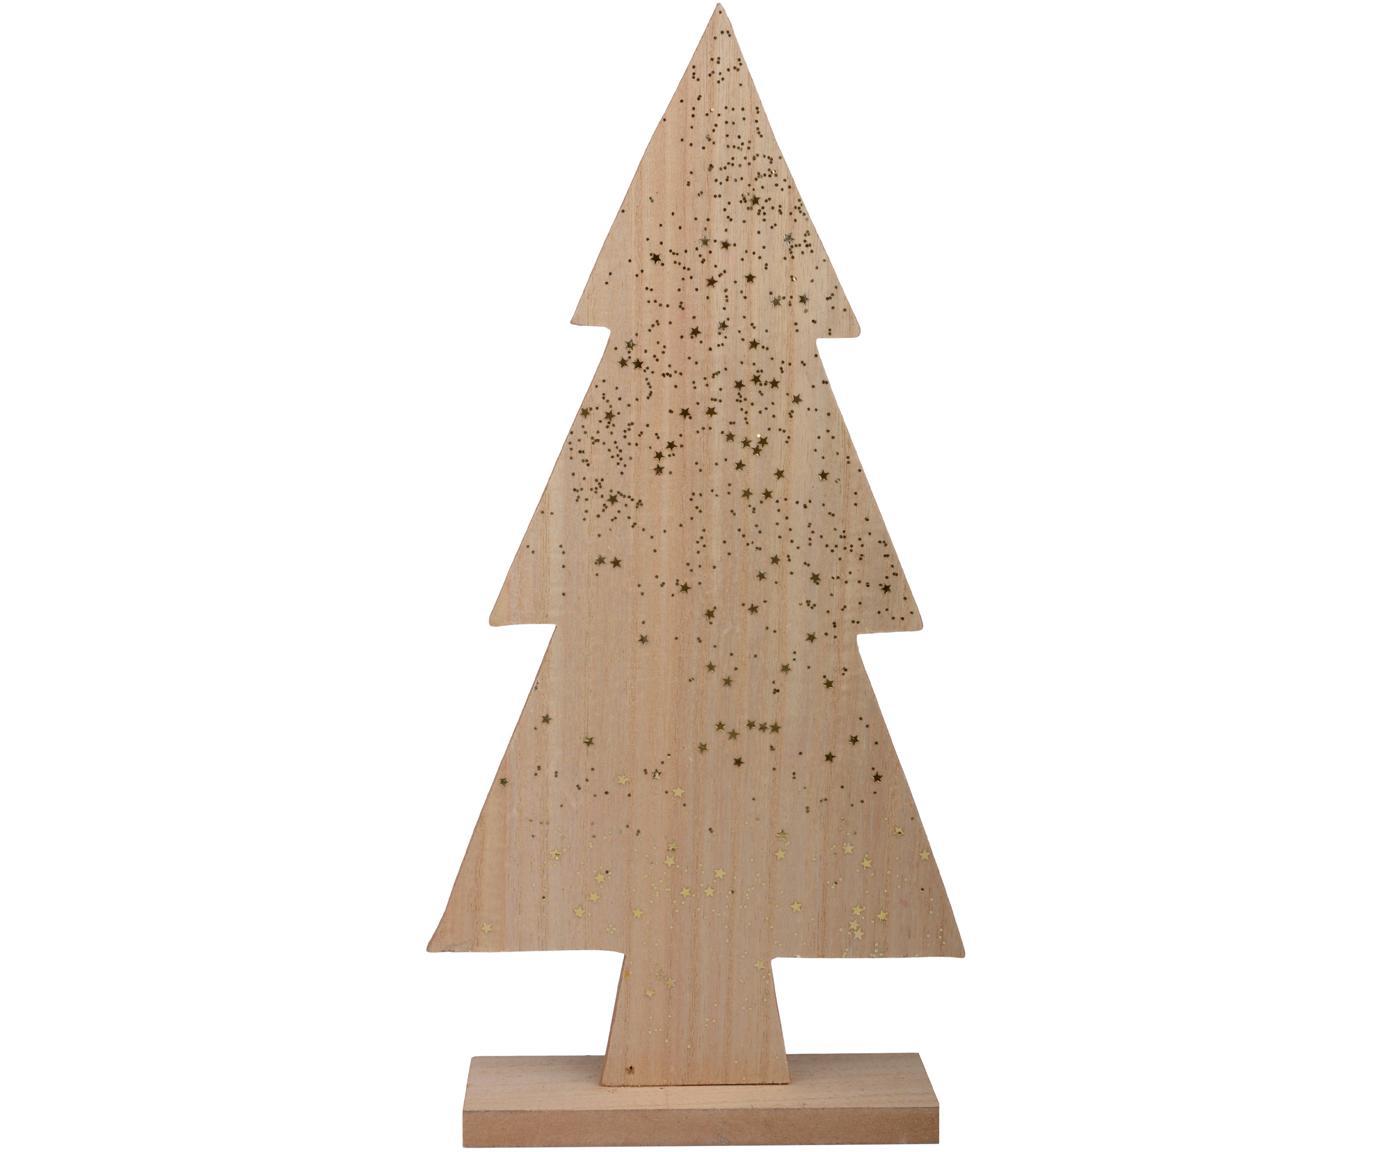 Deko-Objekt Glean, Holz, Holz, Goldfarben, 17 x 36 cm